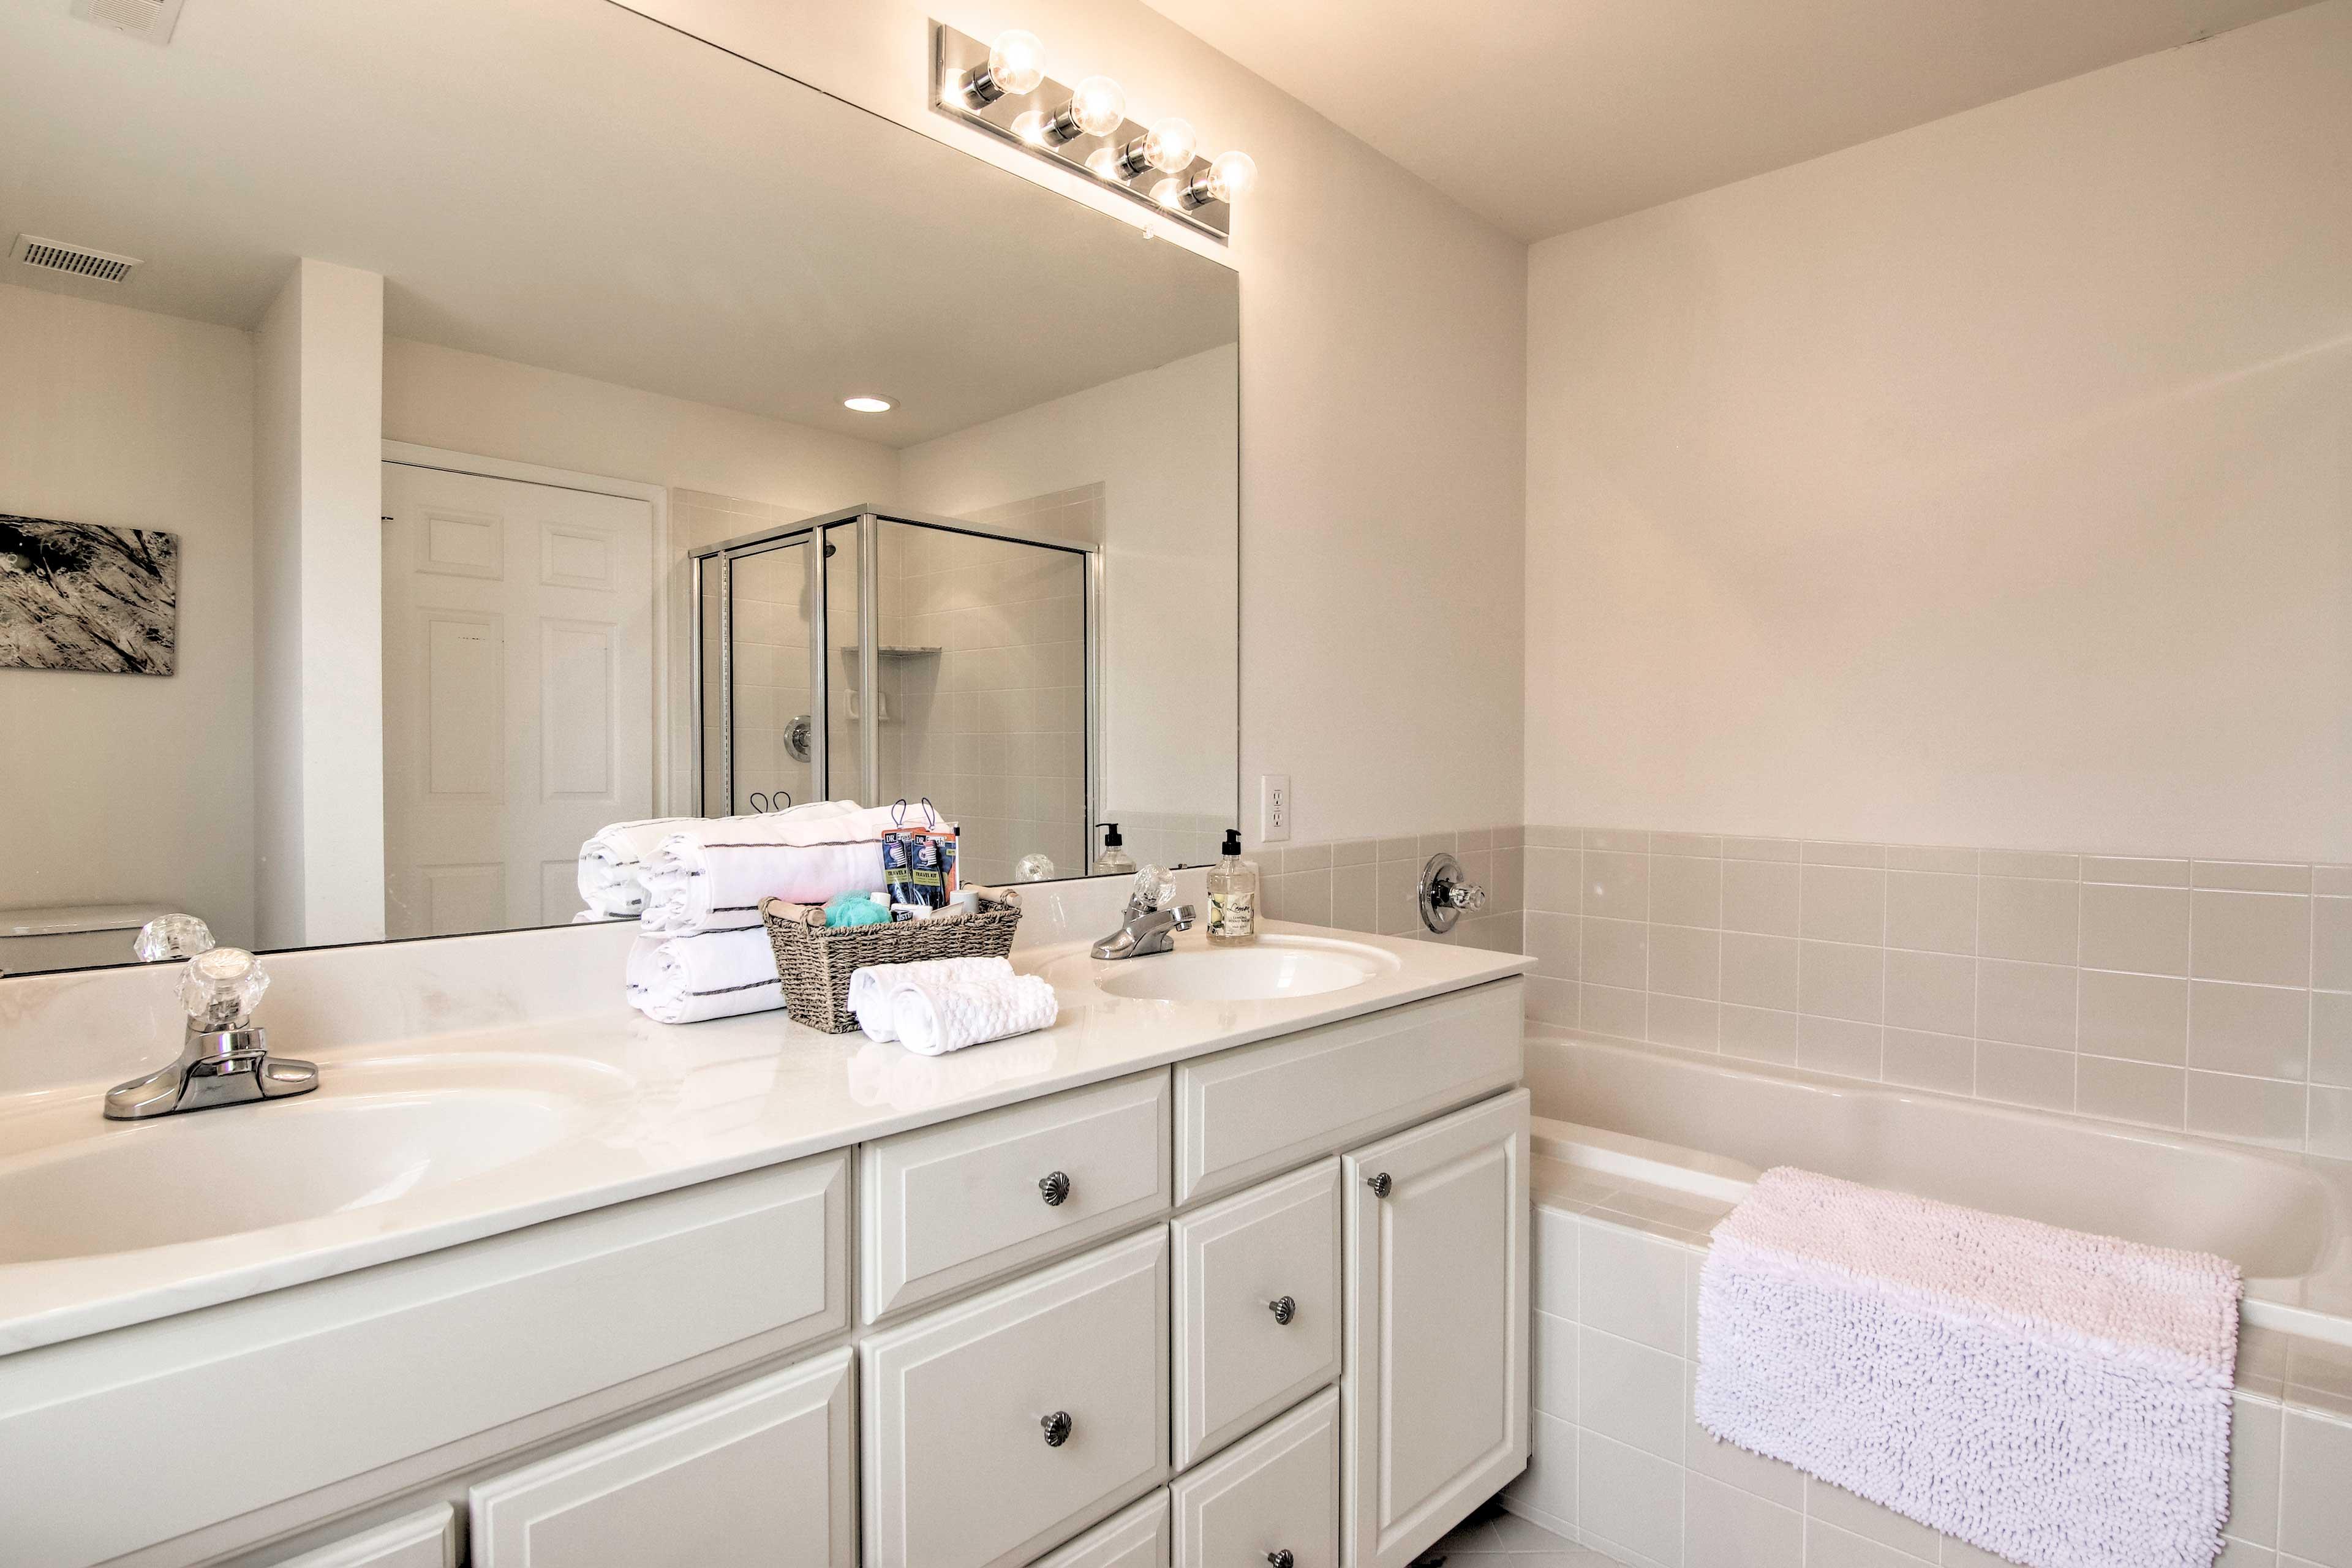 The en-suite bathroom features a soaking tub, dual sinks & walk-in shower.